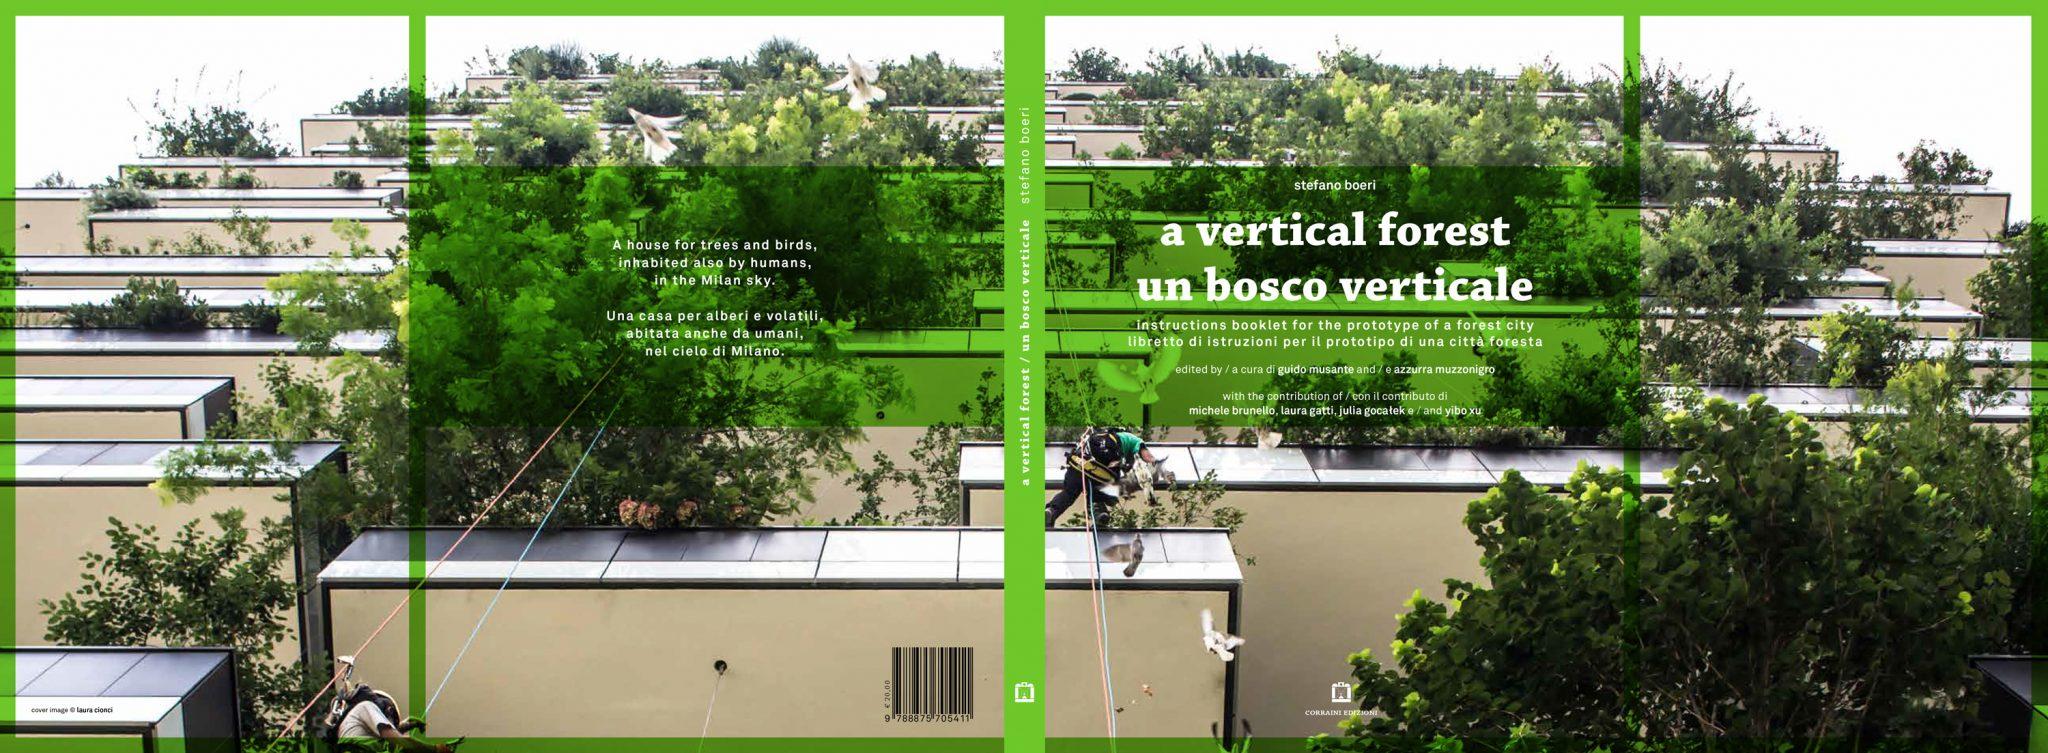 PRESENTATION OF THE BOOK: A VERTICAL FOREST | Stefano Boeri Architetti